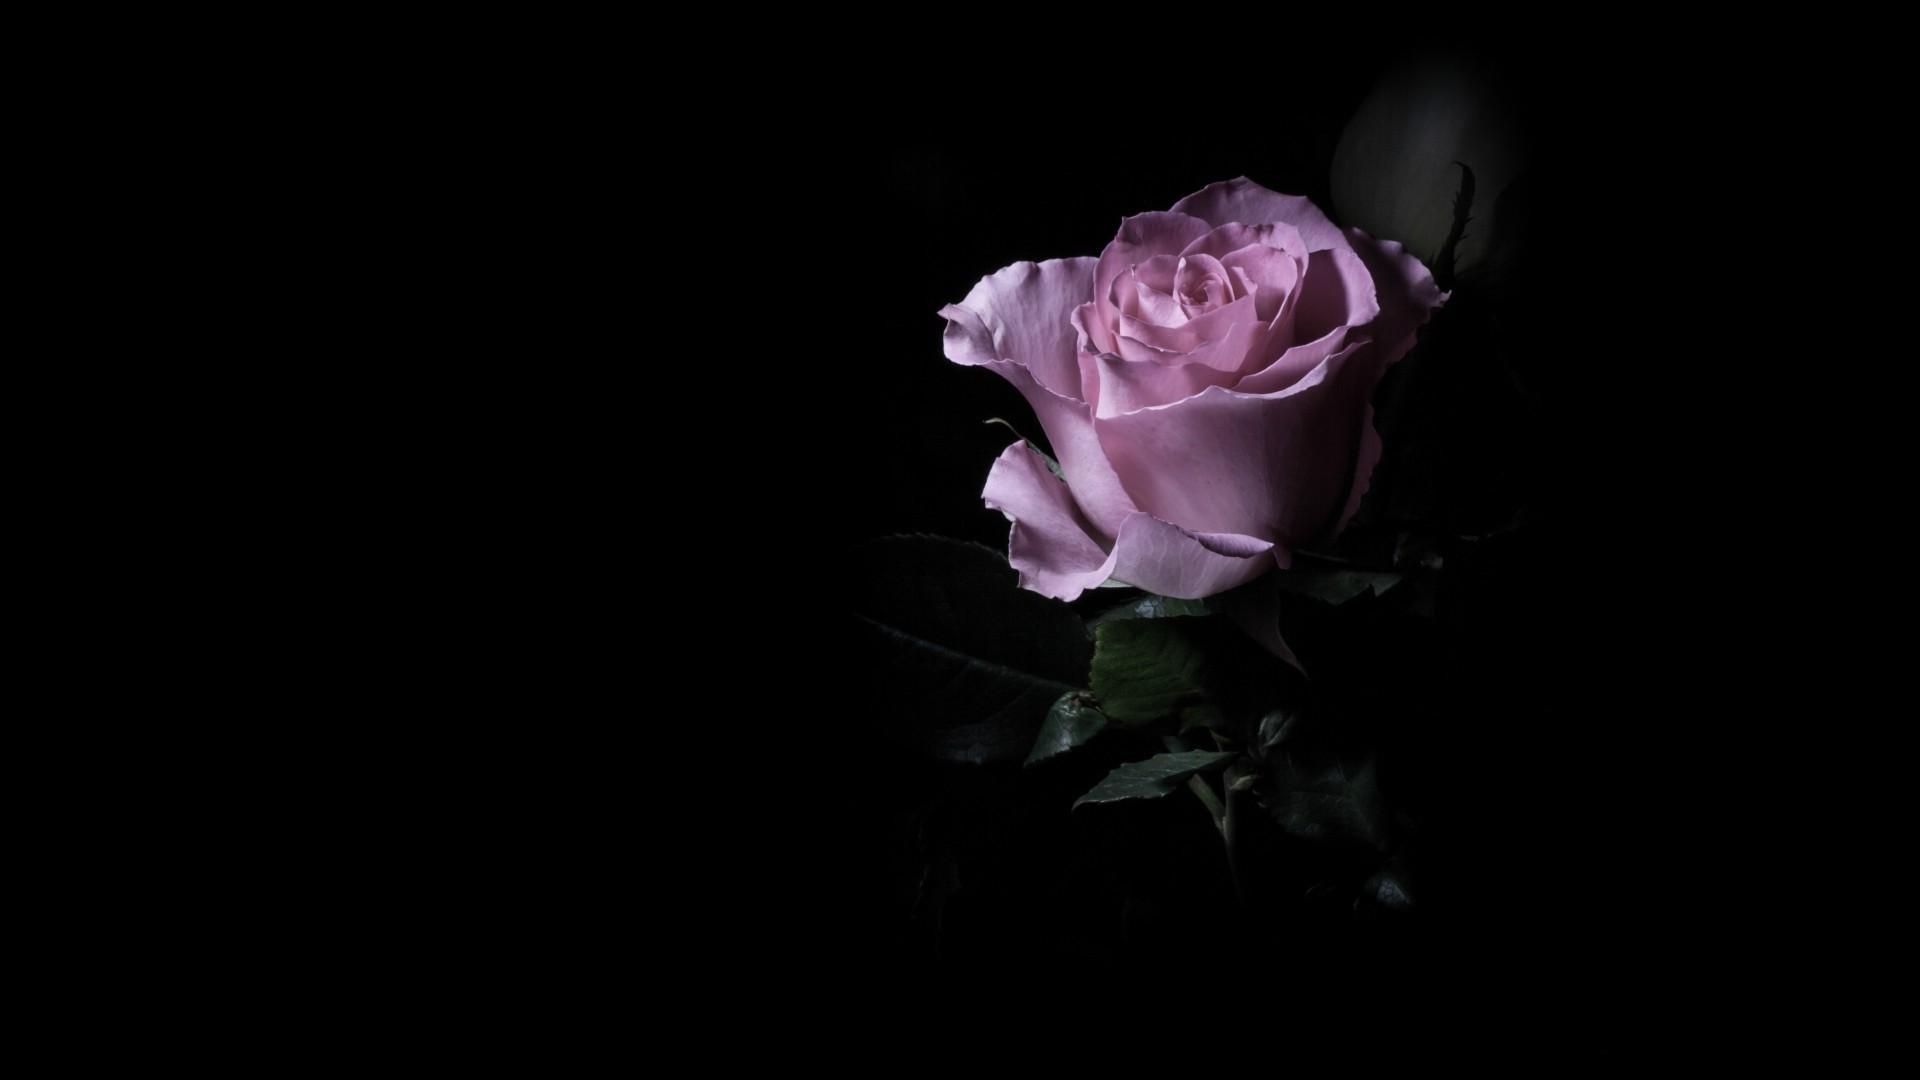 Res: 1920x1080, Purple Rose Wallpaper